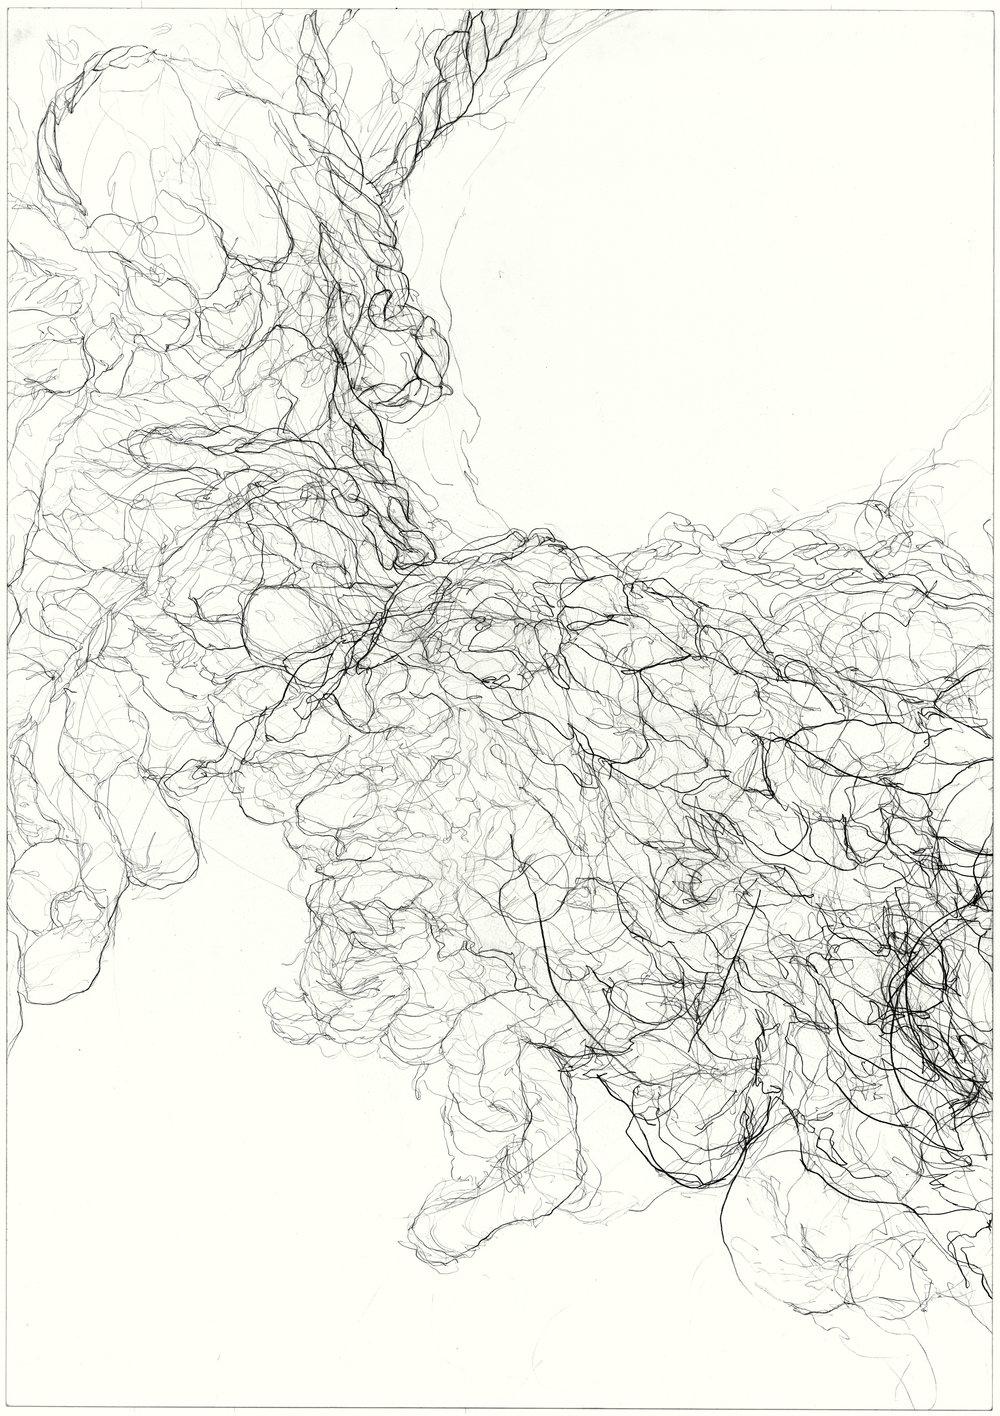 Worn  2011, pencil on paper, 84.1 cm x 59.5 cm.